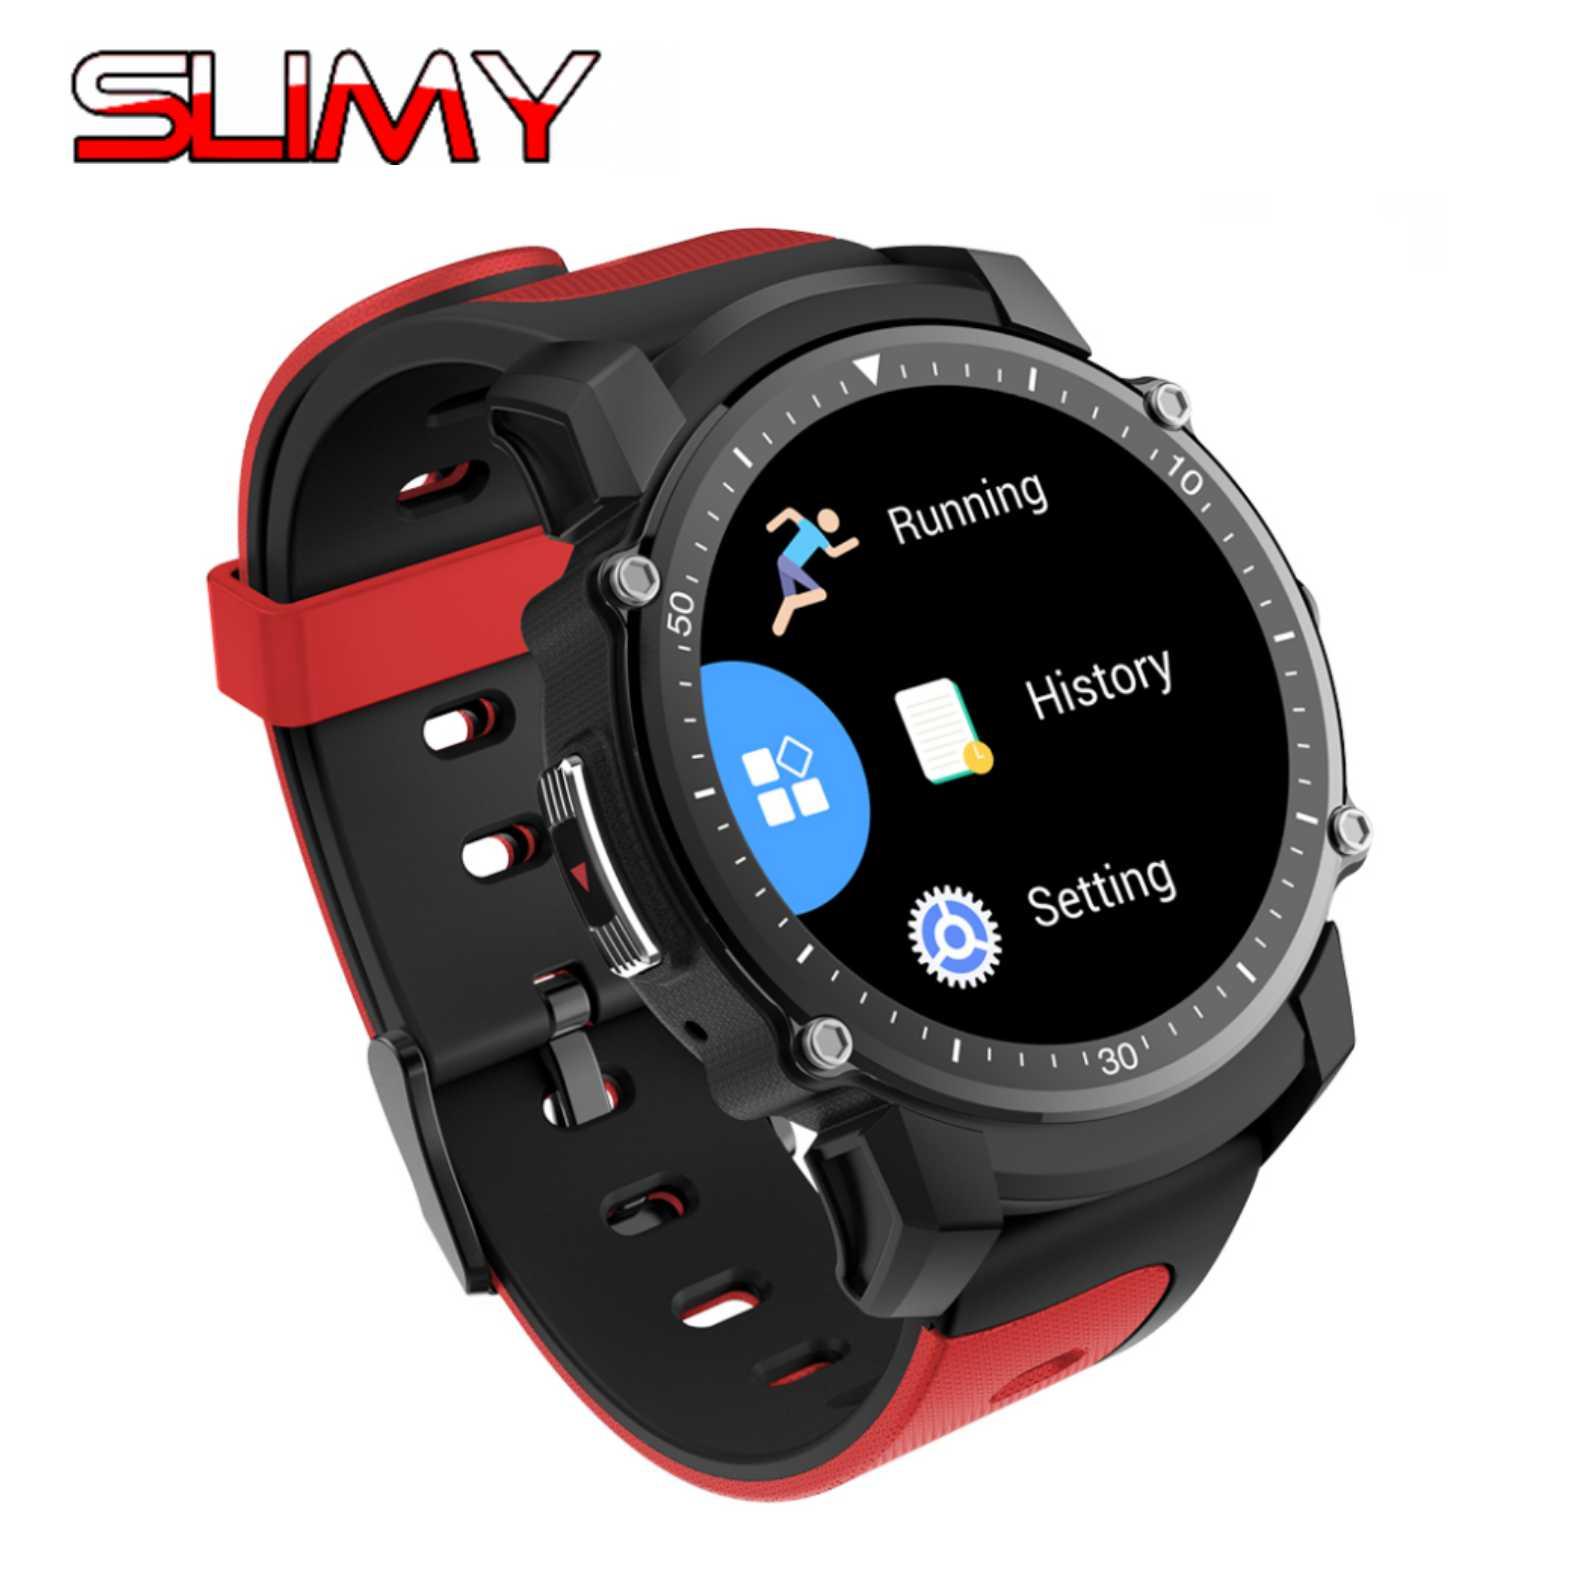 Slimy GPS Bluetooth 4.0 Multi-mode Sports Smart Watch IP68 Waterproof Dynamic Heart Rate Monitor Wristwatch Outdoor Smartwatch no 1 f2 ip68 bluetooth smartwatch green